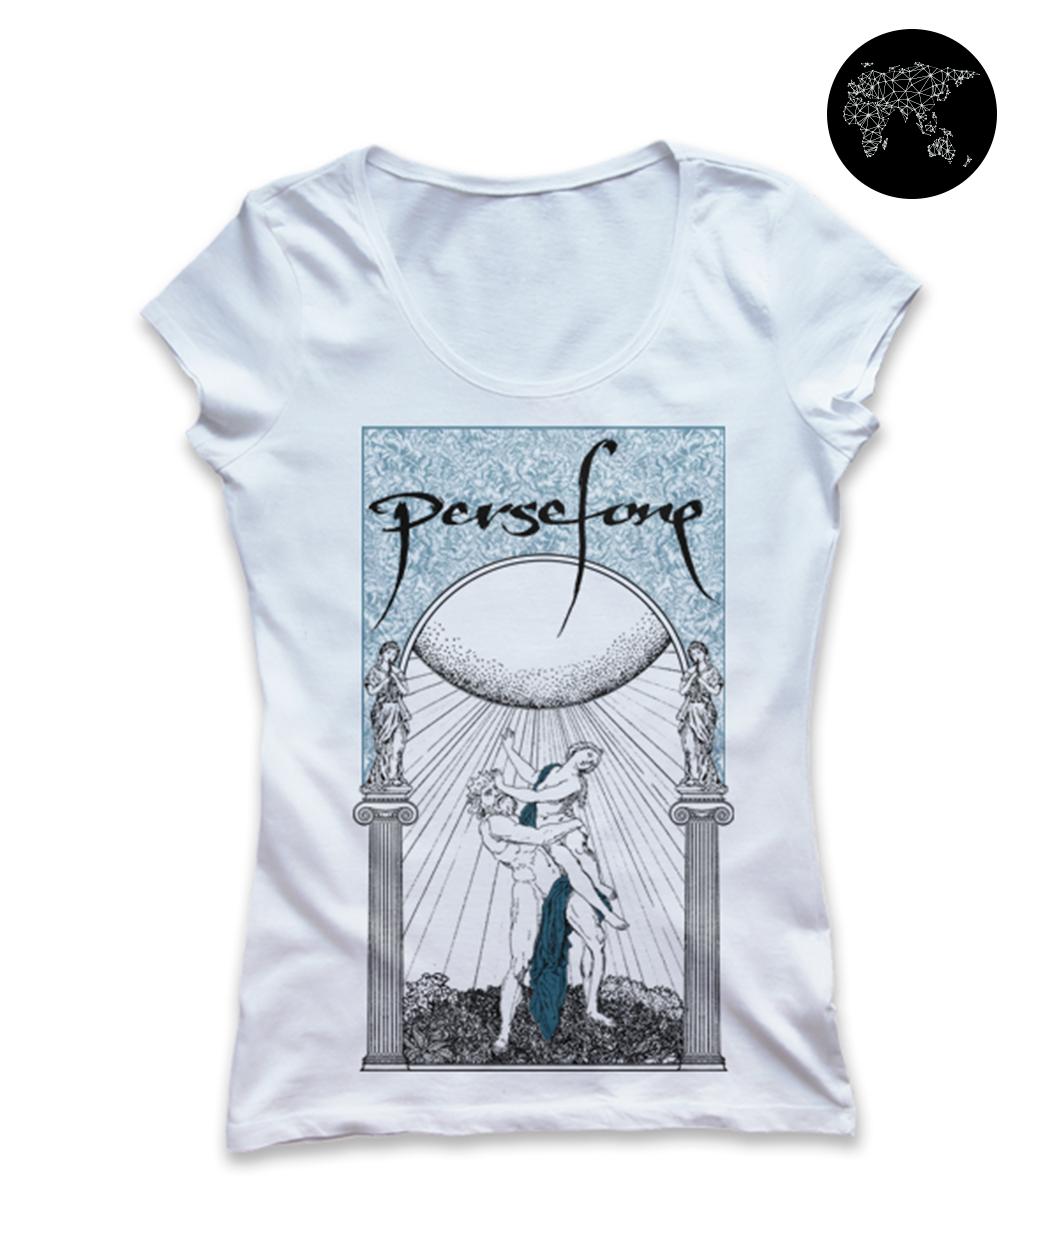 Persefone Goddess and Hades T-shirt Europe